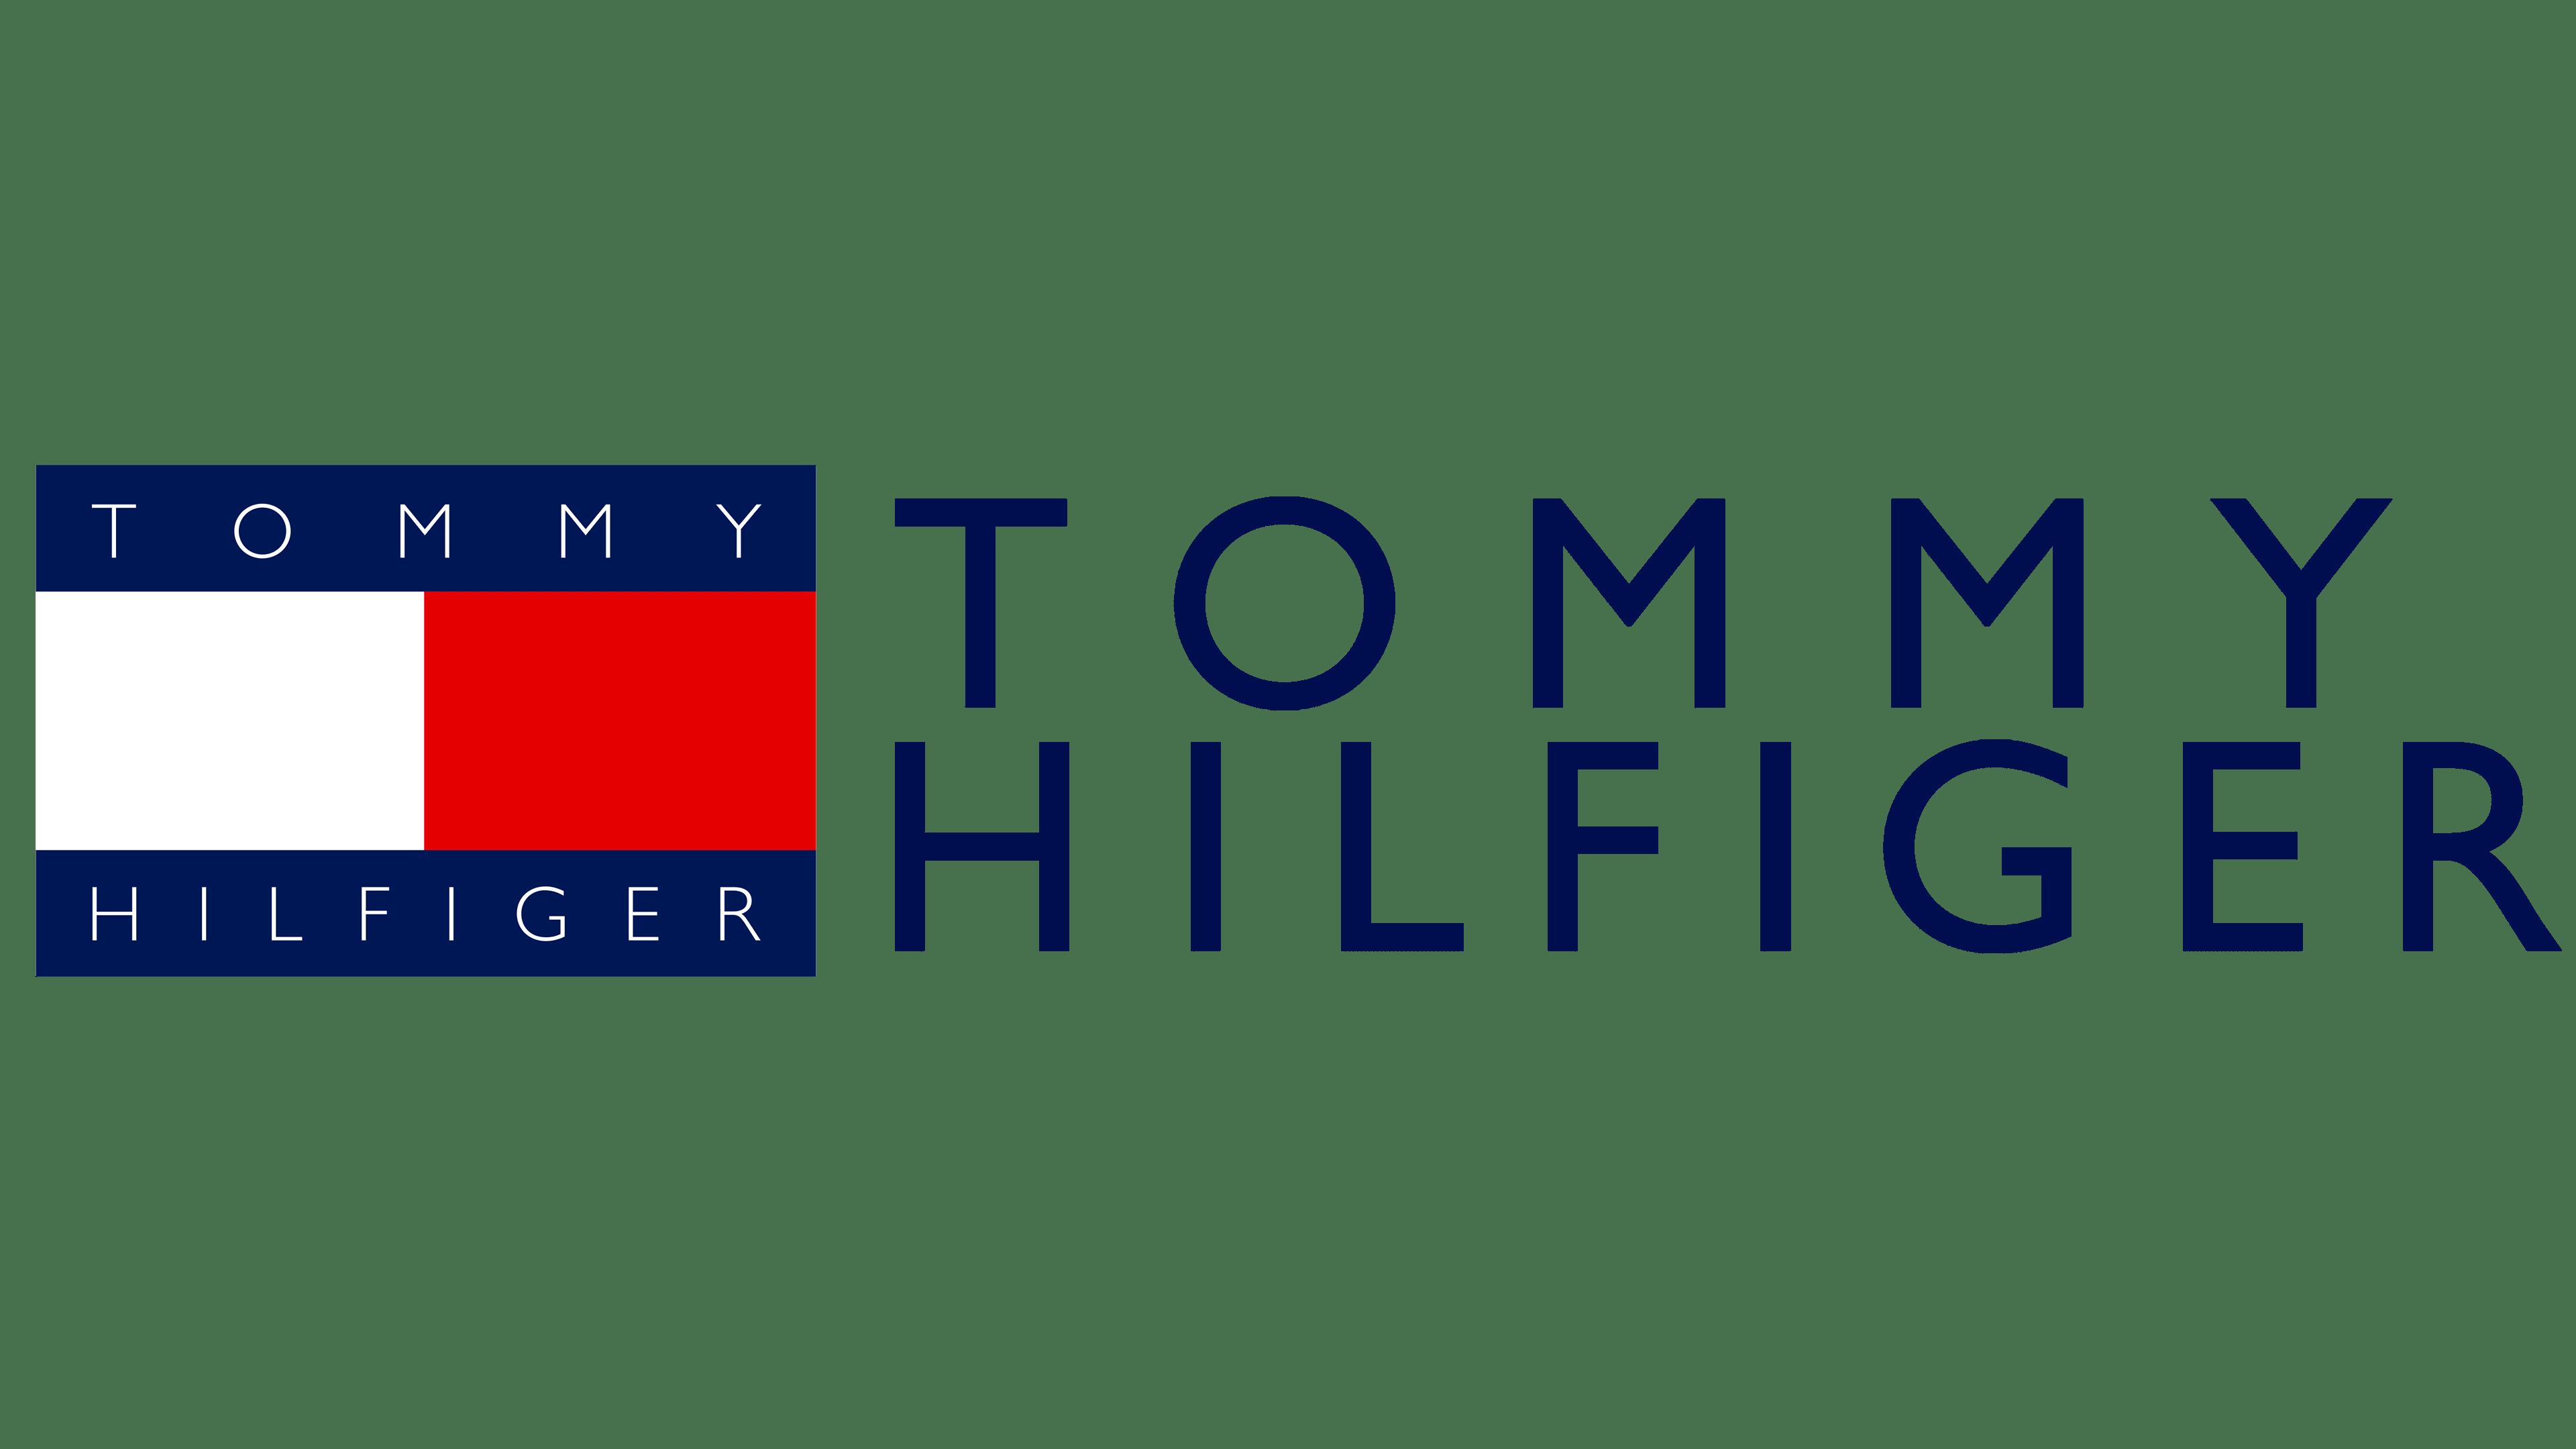 TOMMY- Hilfiger